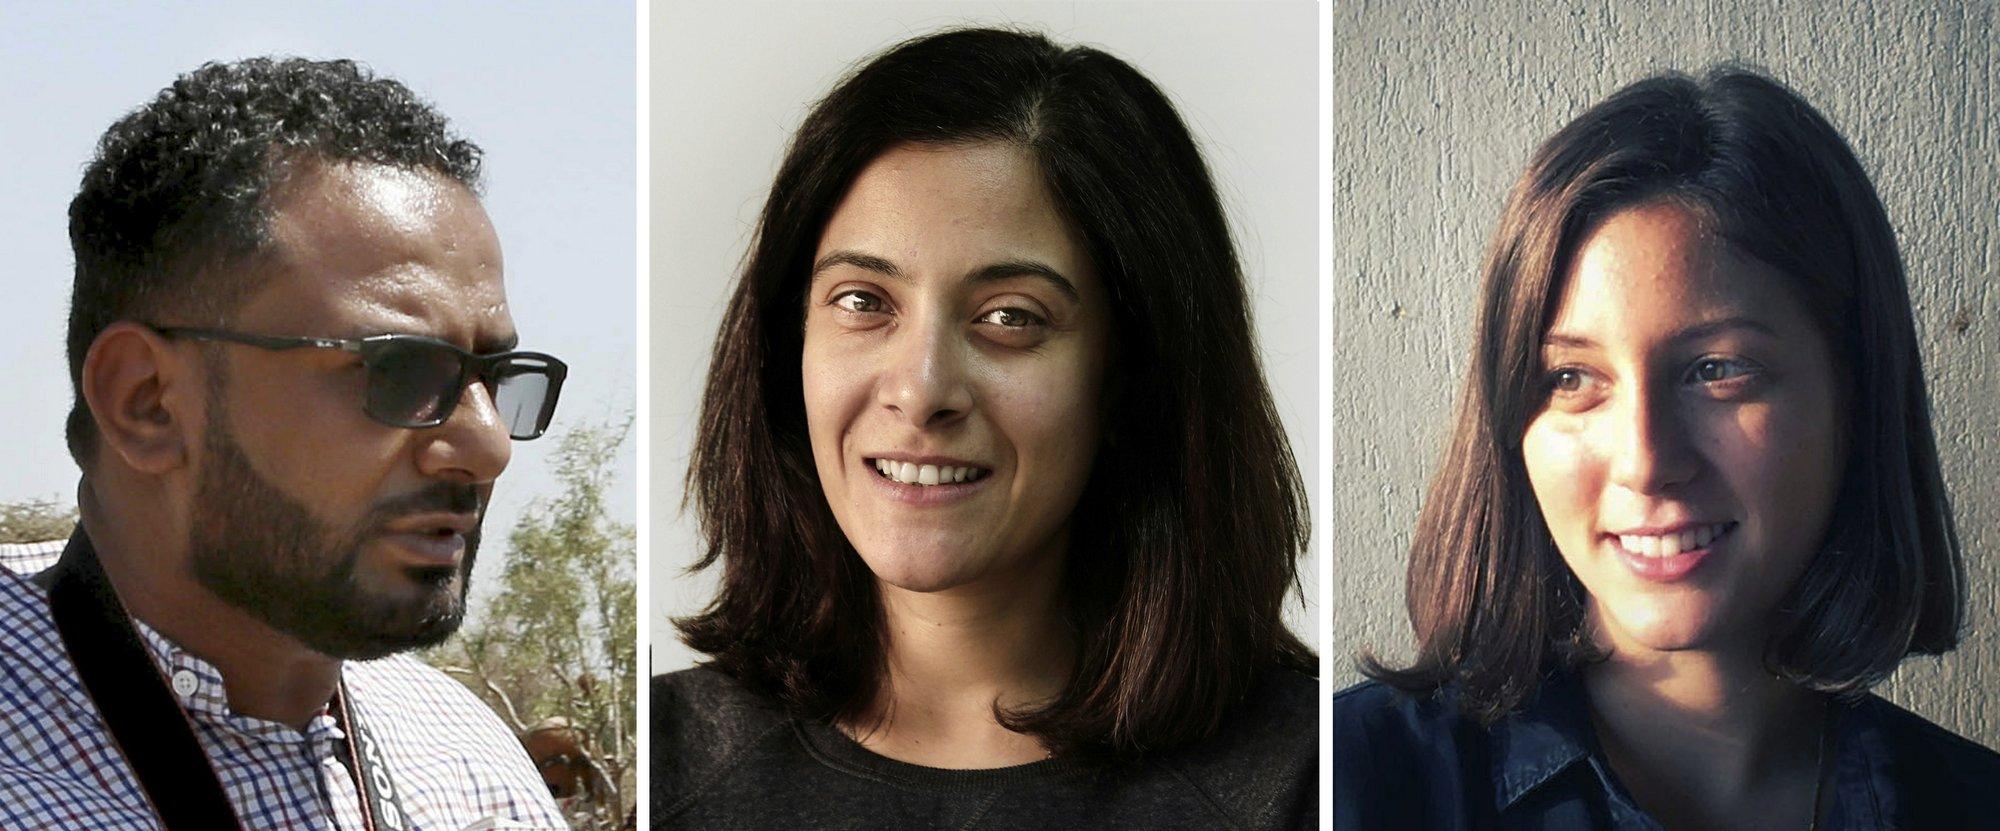 Maad al-Zikry, Maggie Michael, Nariman El-Mofty